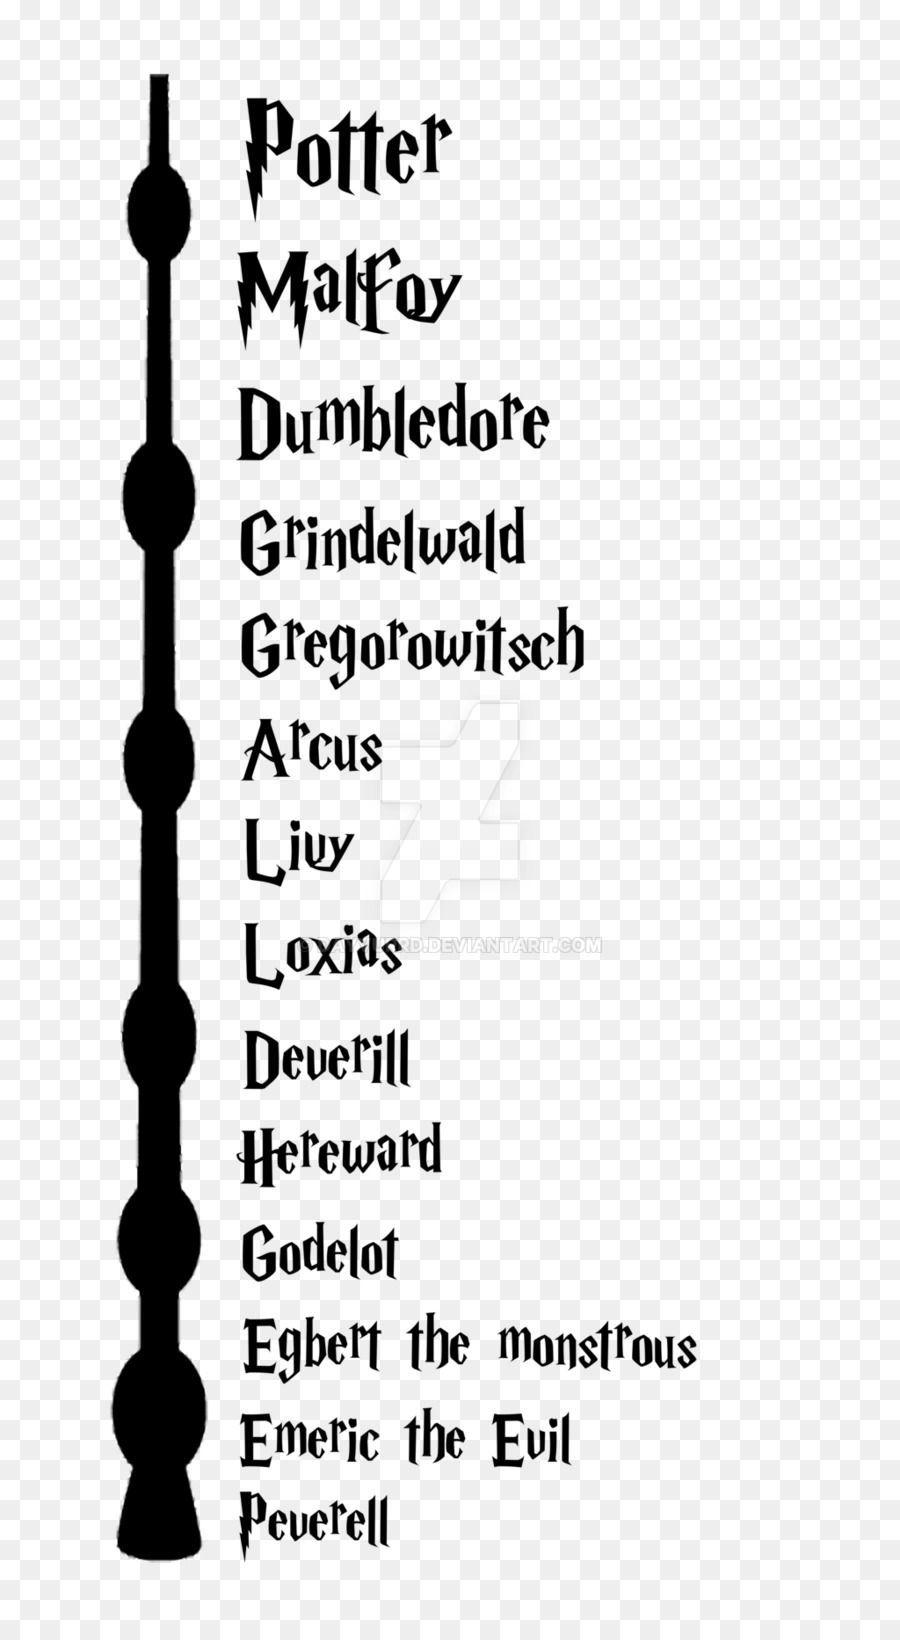 Albus Dumbledore Lord Voldemort Draco Malfoy Gellert Grindelwald Harry Potter Harry Potter Harry Harry Potter Spells Harry Potter Images Harry Potter Tumblr